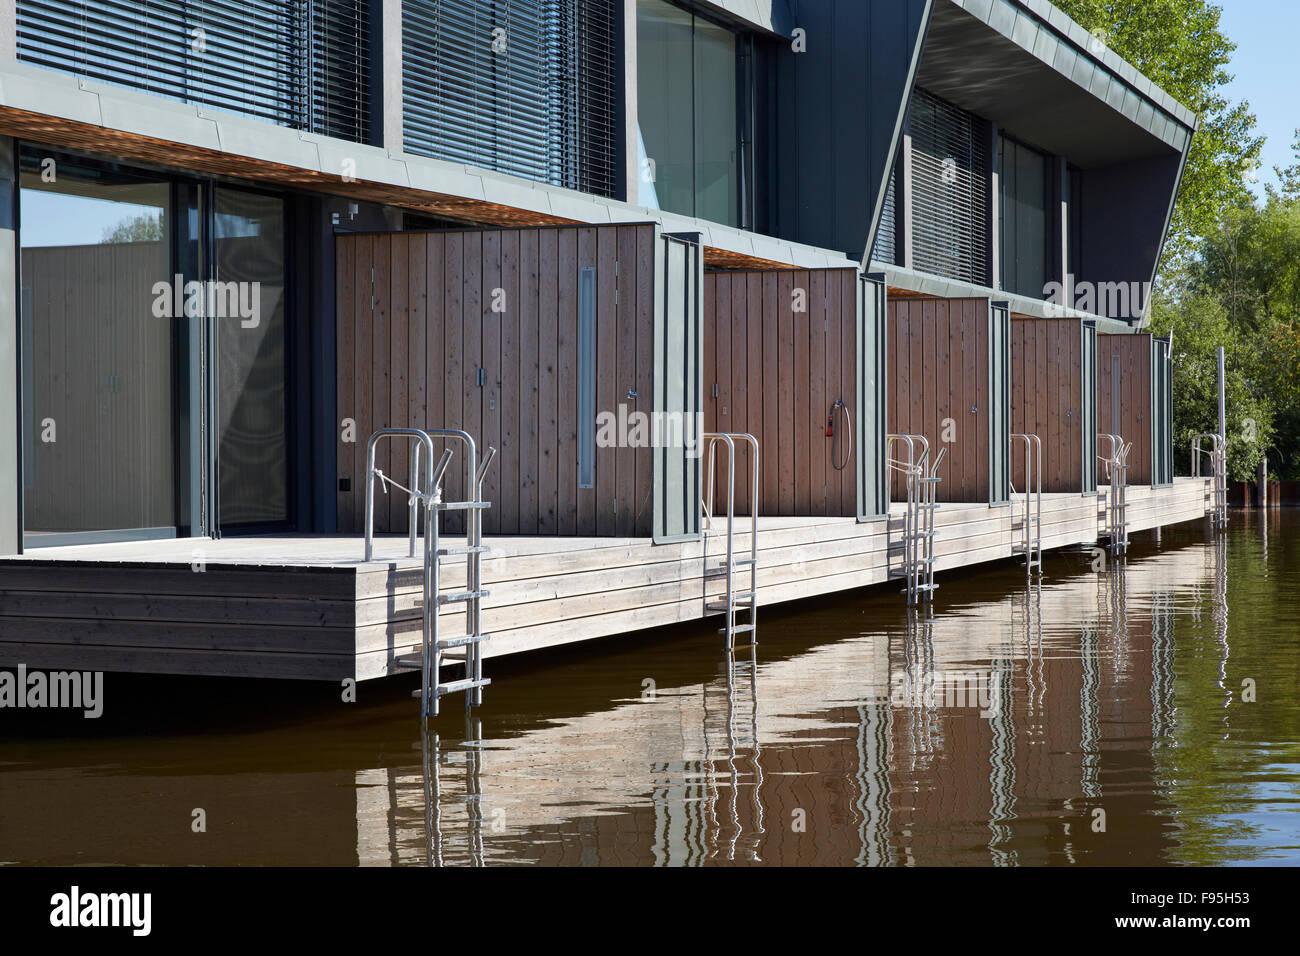 Wohnsiedlung am Neusiedler See, am Neusiedl See, Burgenland ...